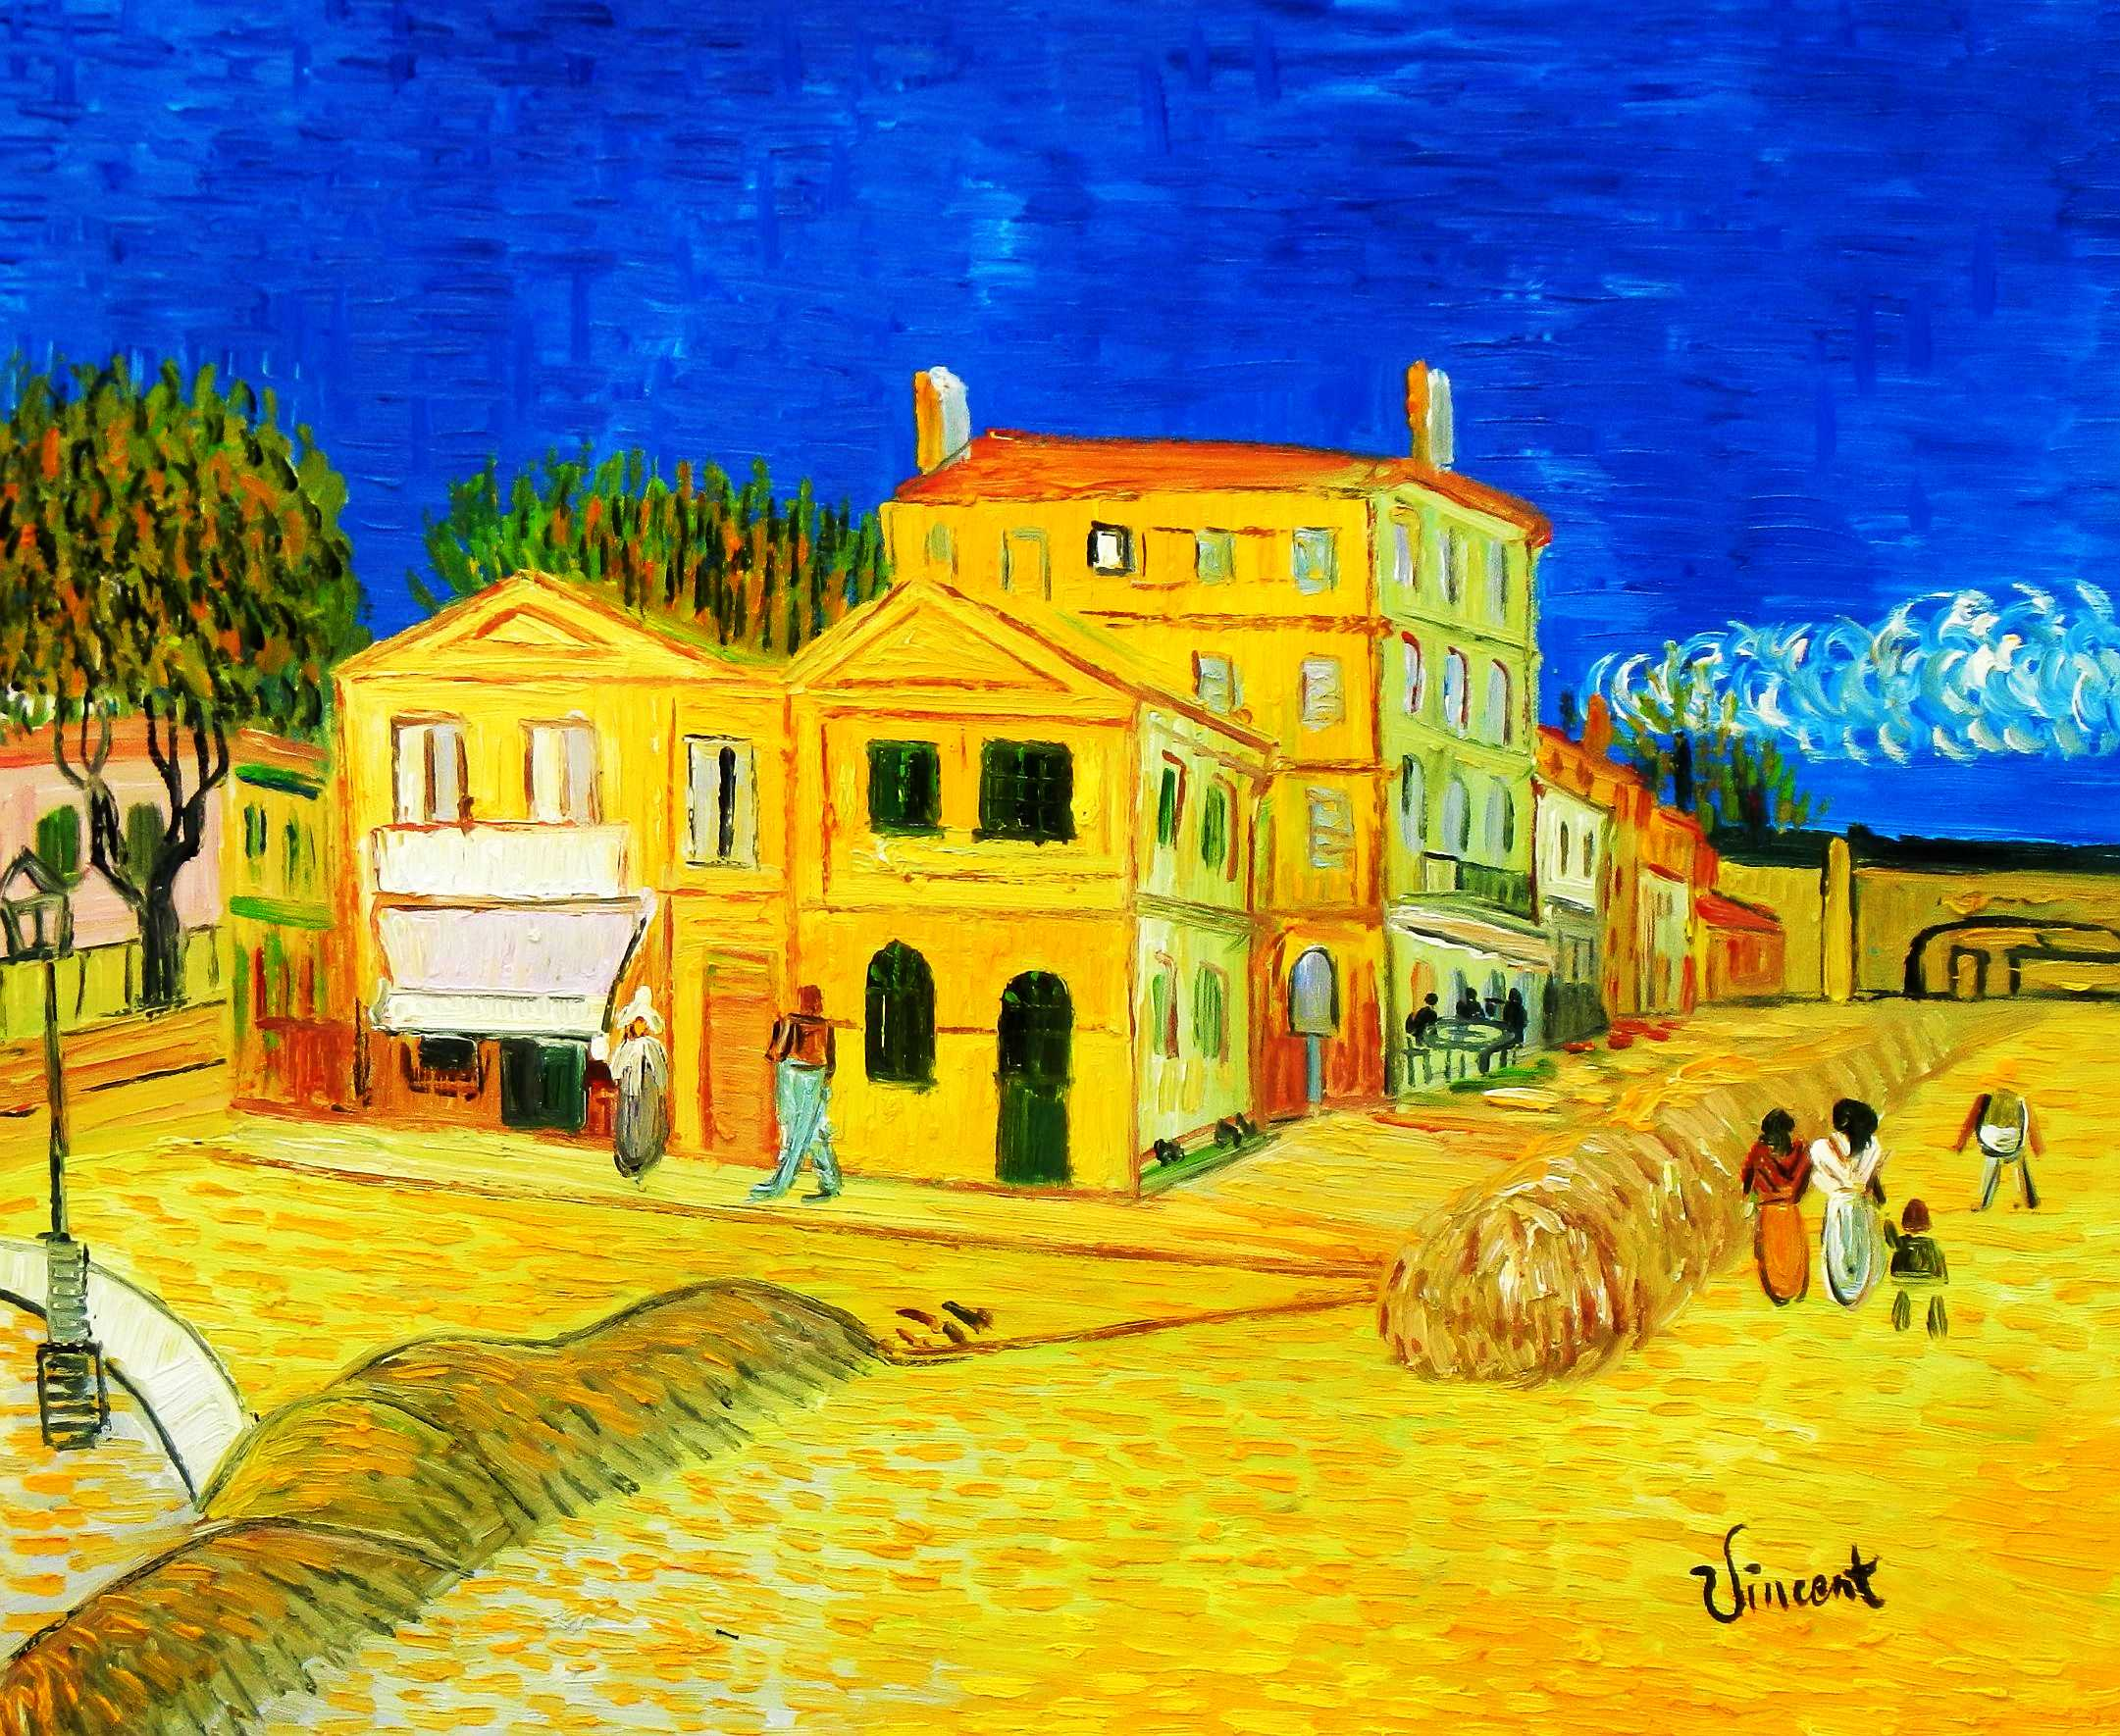 Vincent van Gogh - Das gelbe Haus c95123 50x60cm Gemälde handgemalt